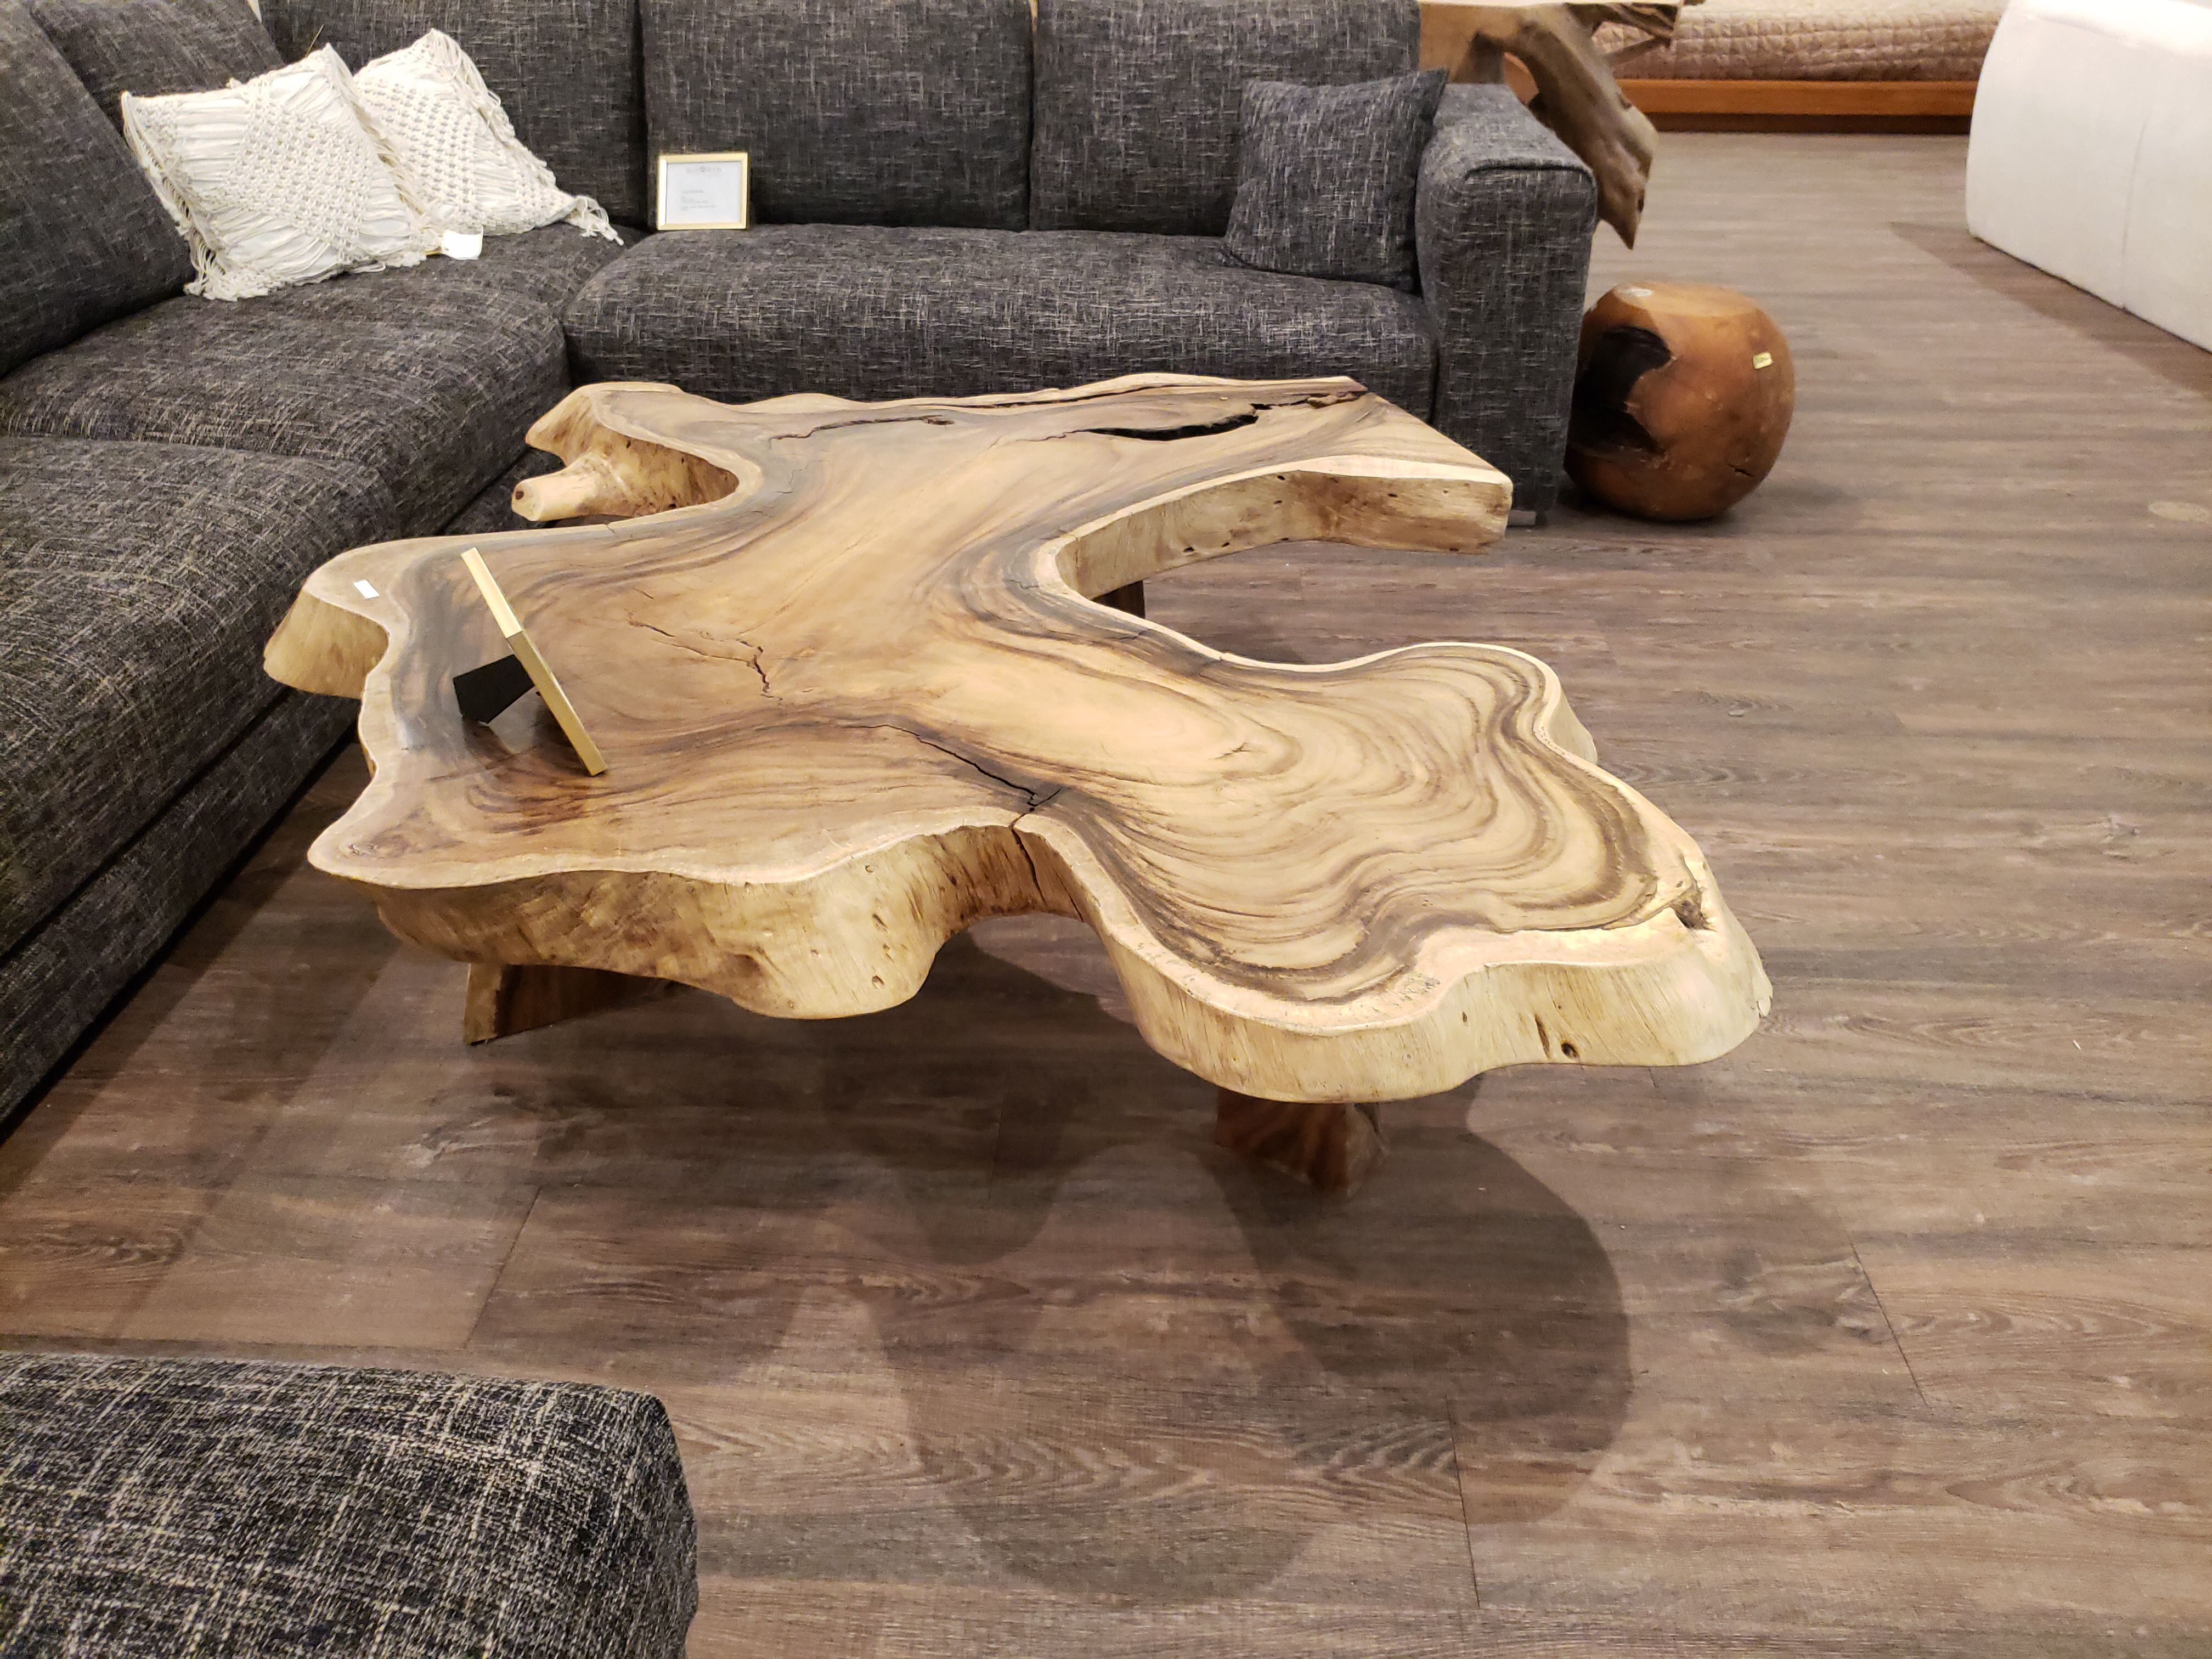 Live Edge Coffee Table Live Edge Wood Table Live Edge Coffee Table Wood Table Design [ 3024 x 4032 Pixel ]